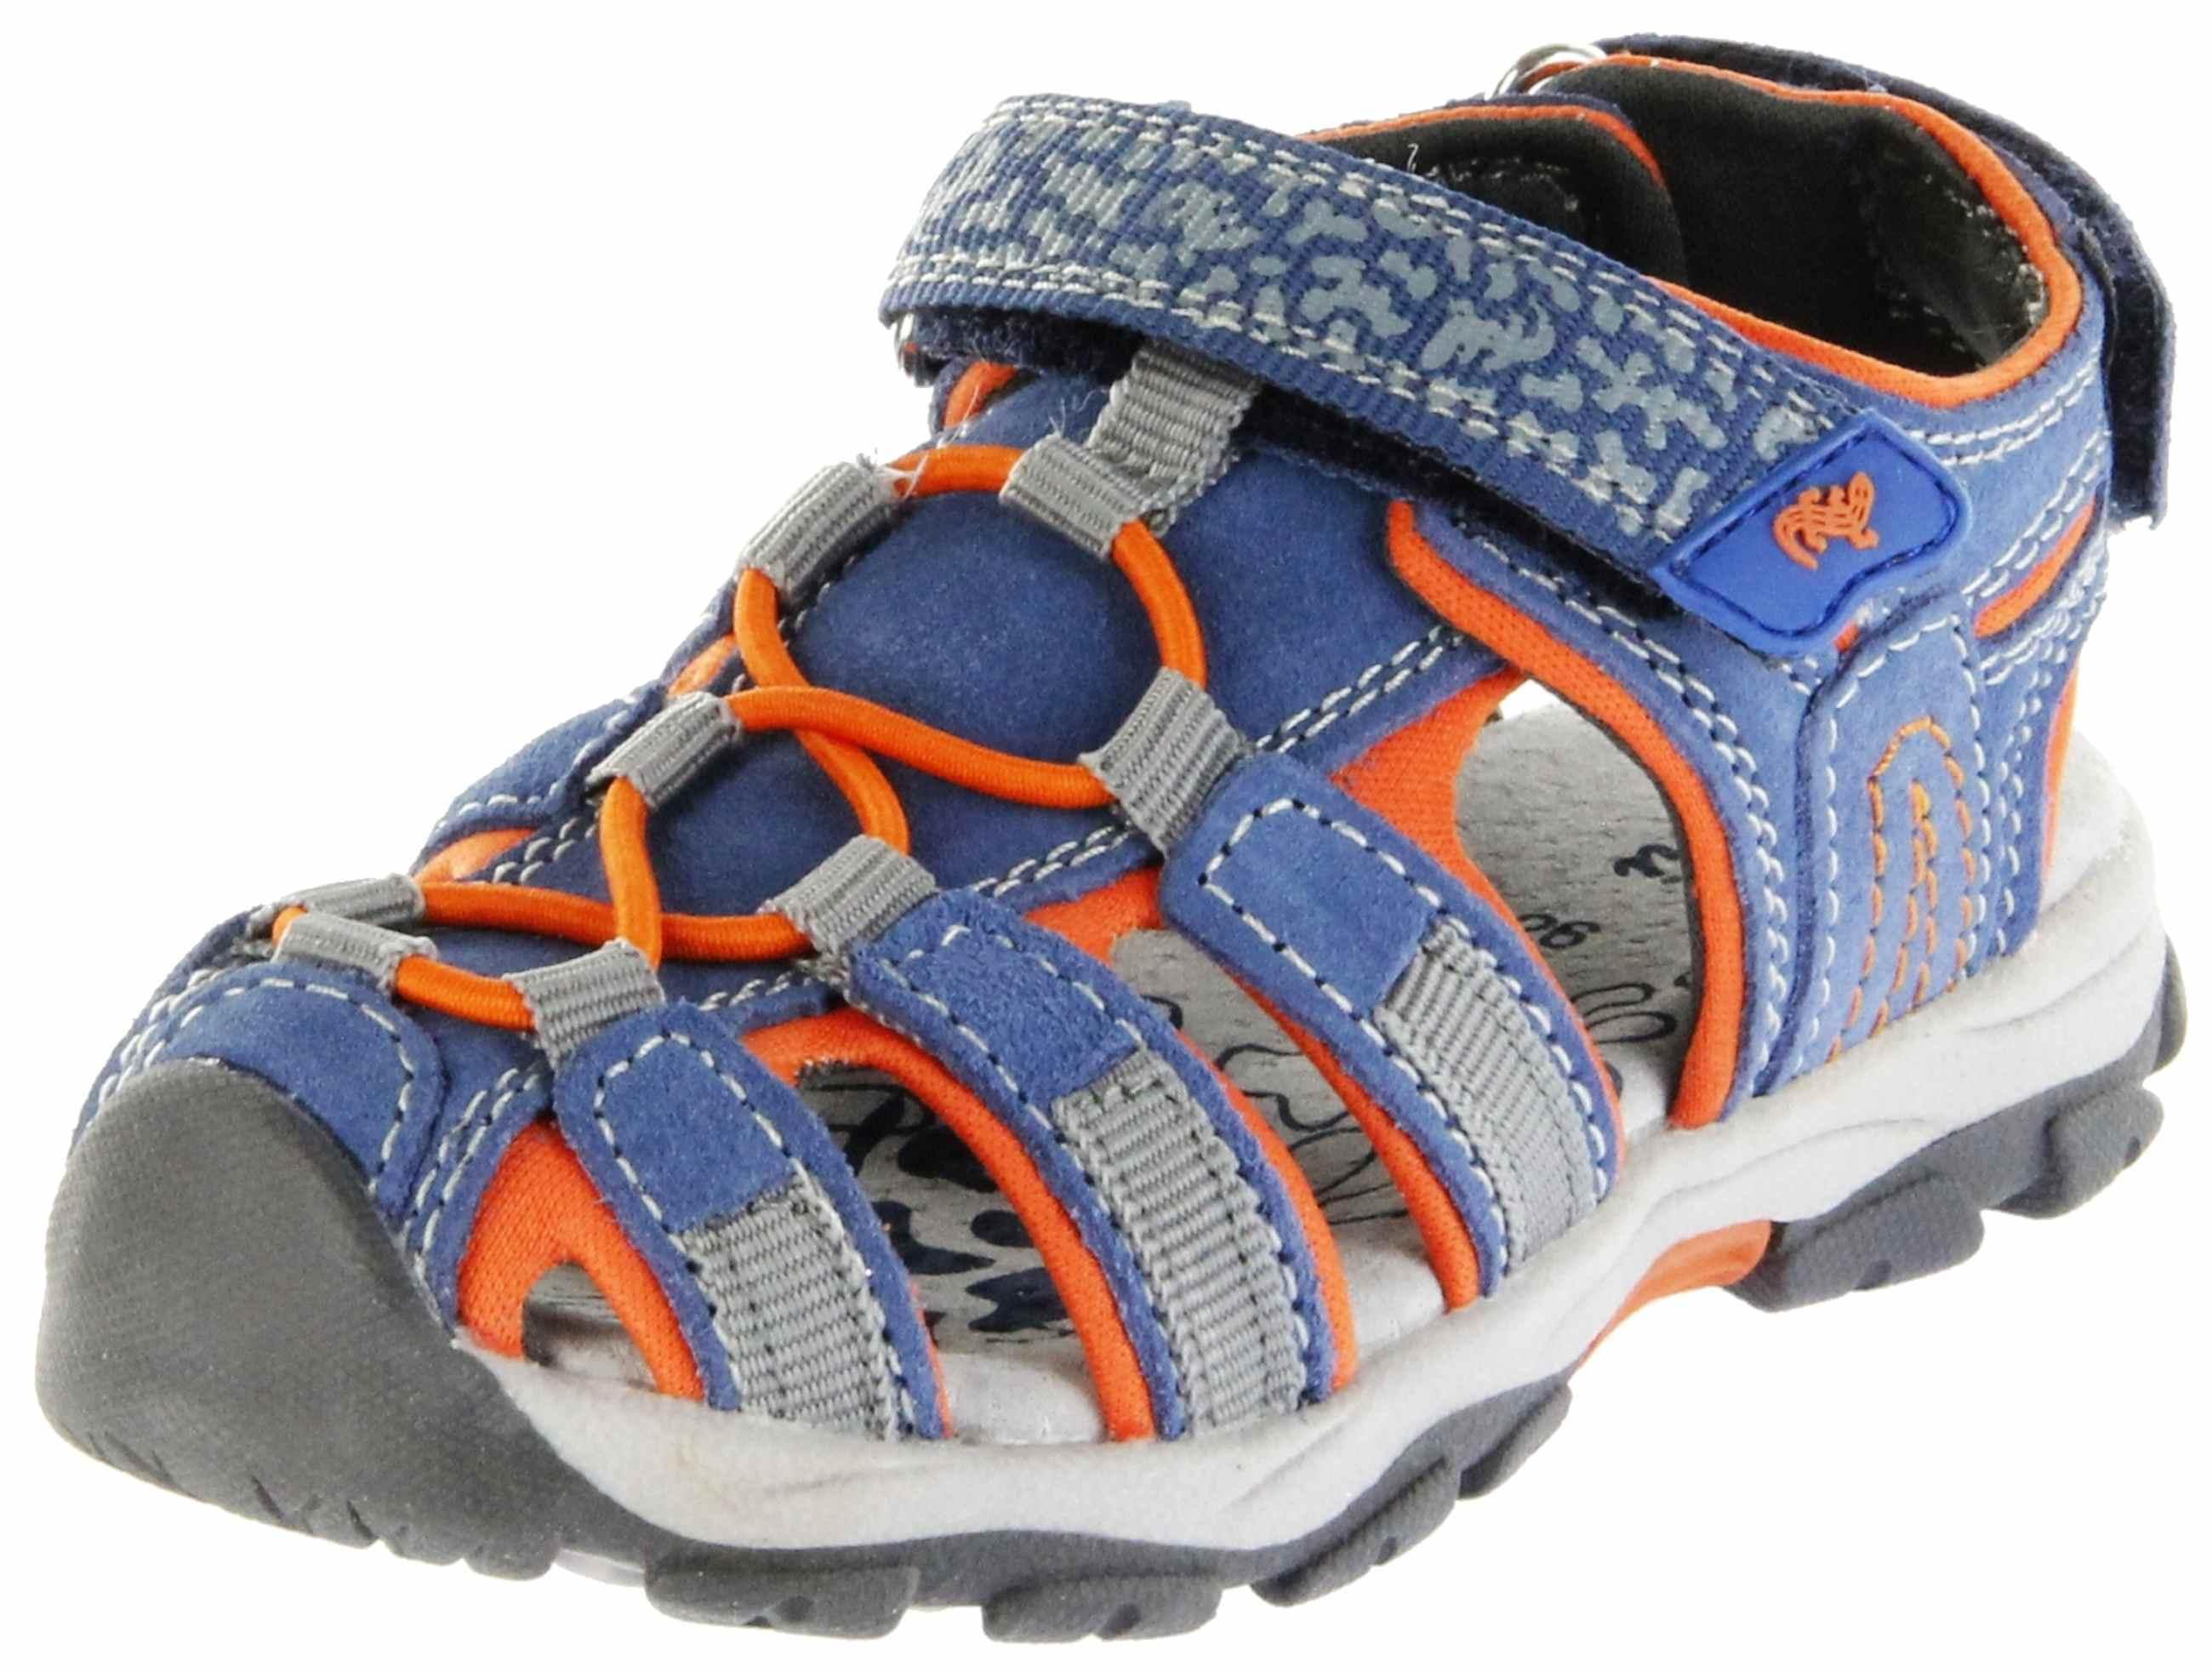 san francisco 29967 c84a4 Lurchi Kinder Outdoor Sandaletten blau Leder Jungen Schuhe 33-21607-42  Jeans Bobby